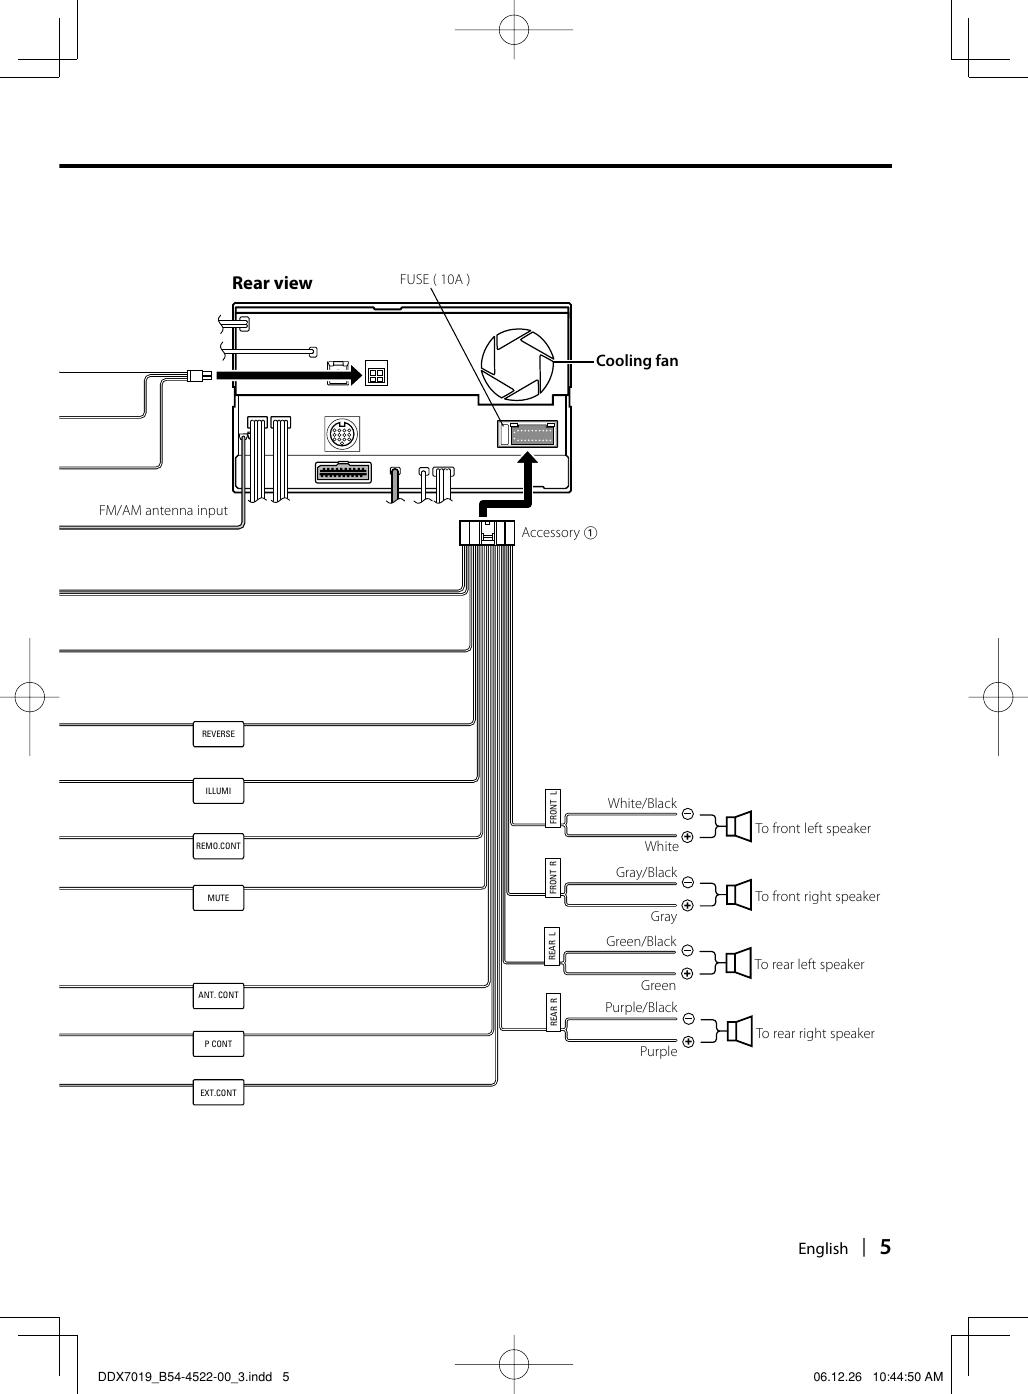 Diagram Kenwood Dnx5140 Wiring Diagram Full Version Hd Quality Wiring Diagram Diagramband Umncv It